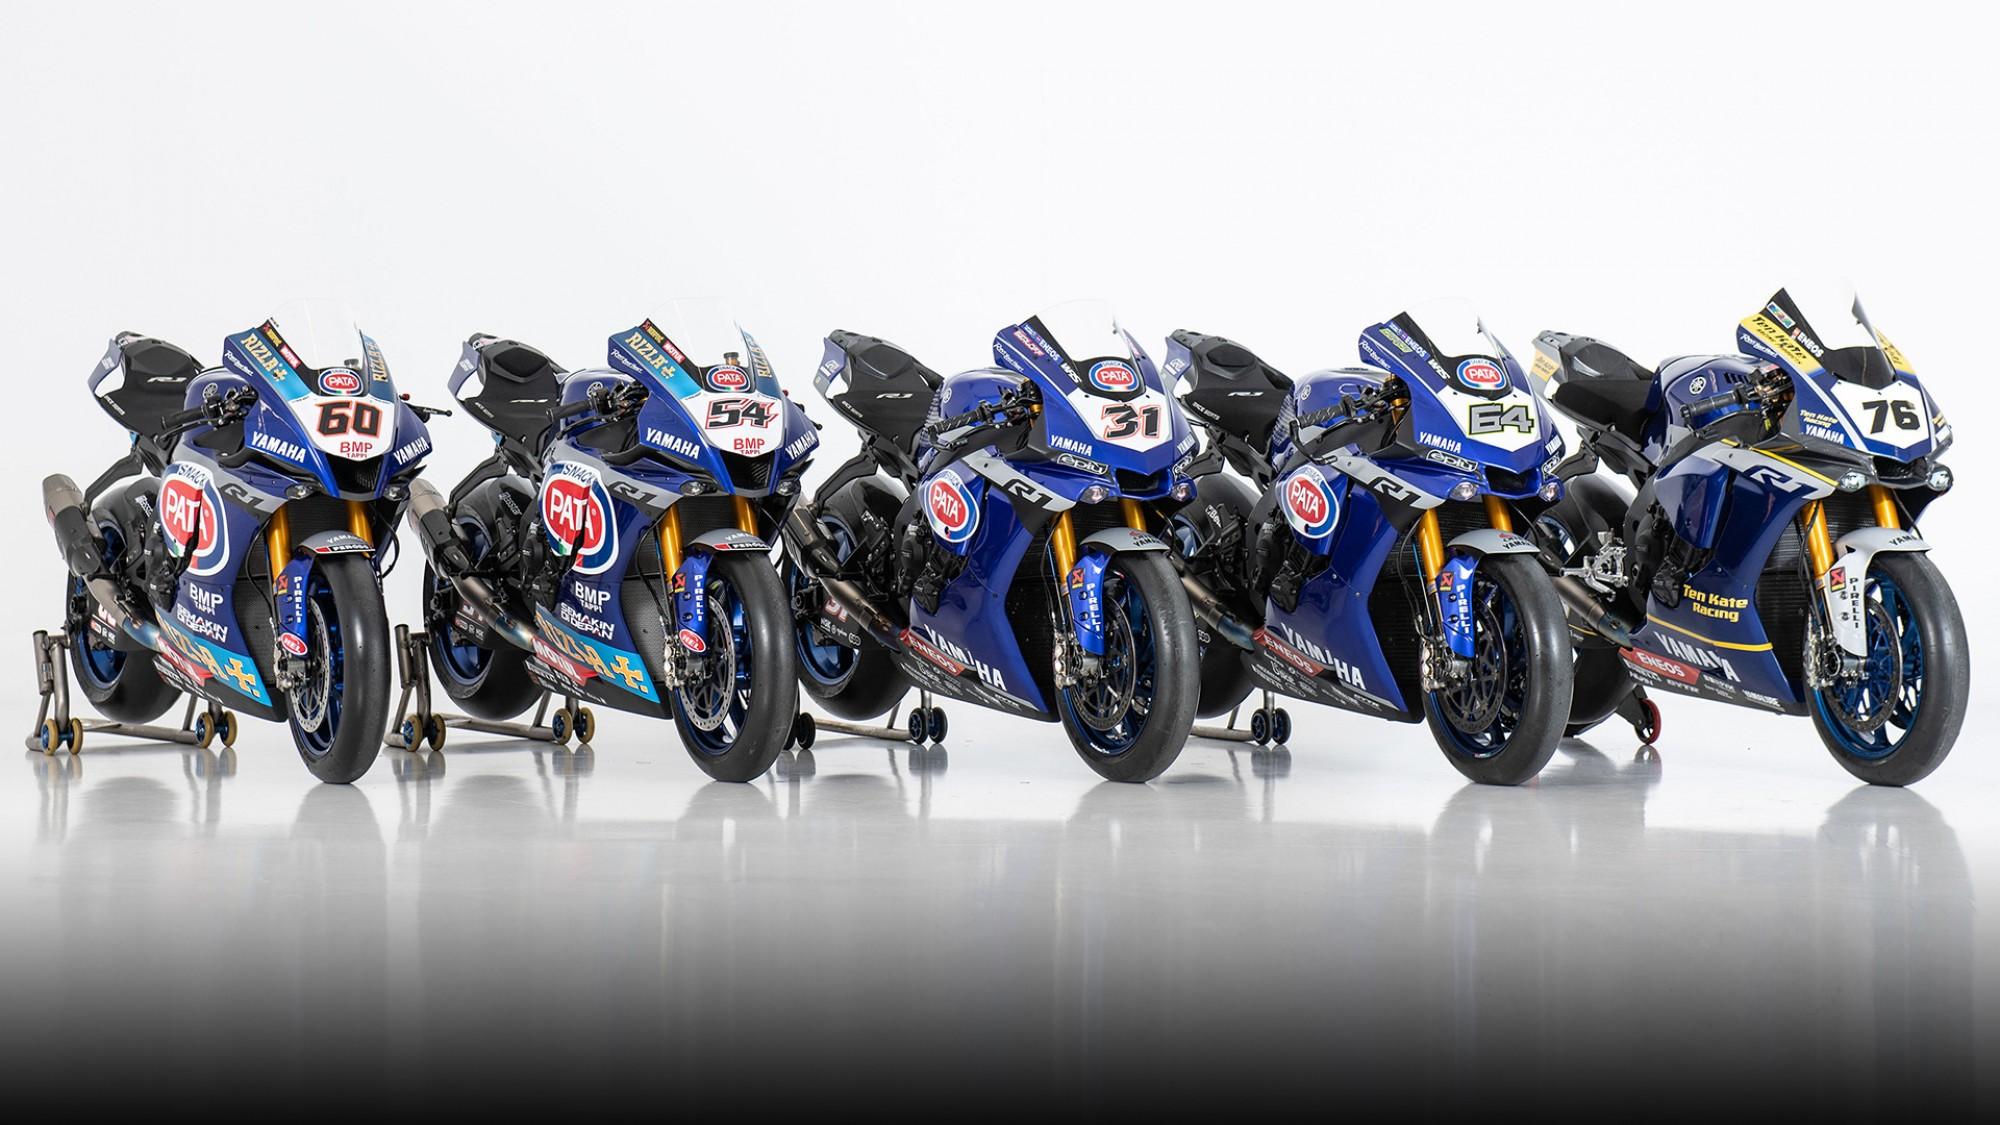 PATA Yamaha unveil WorldSBK colours for 2020 title race